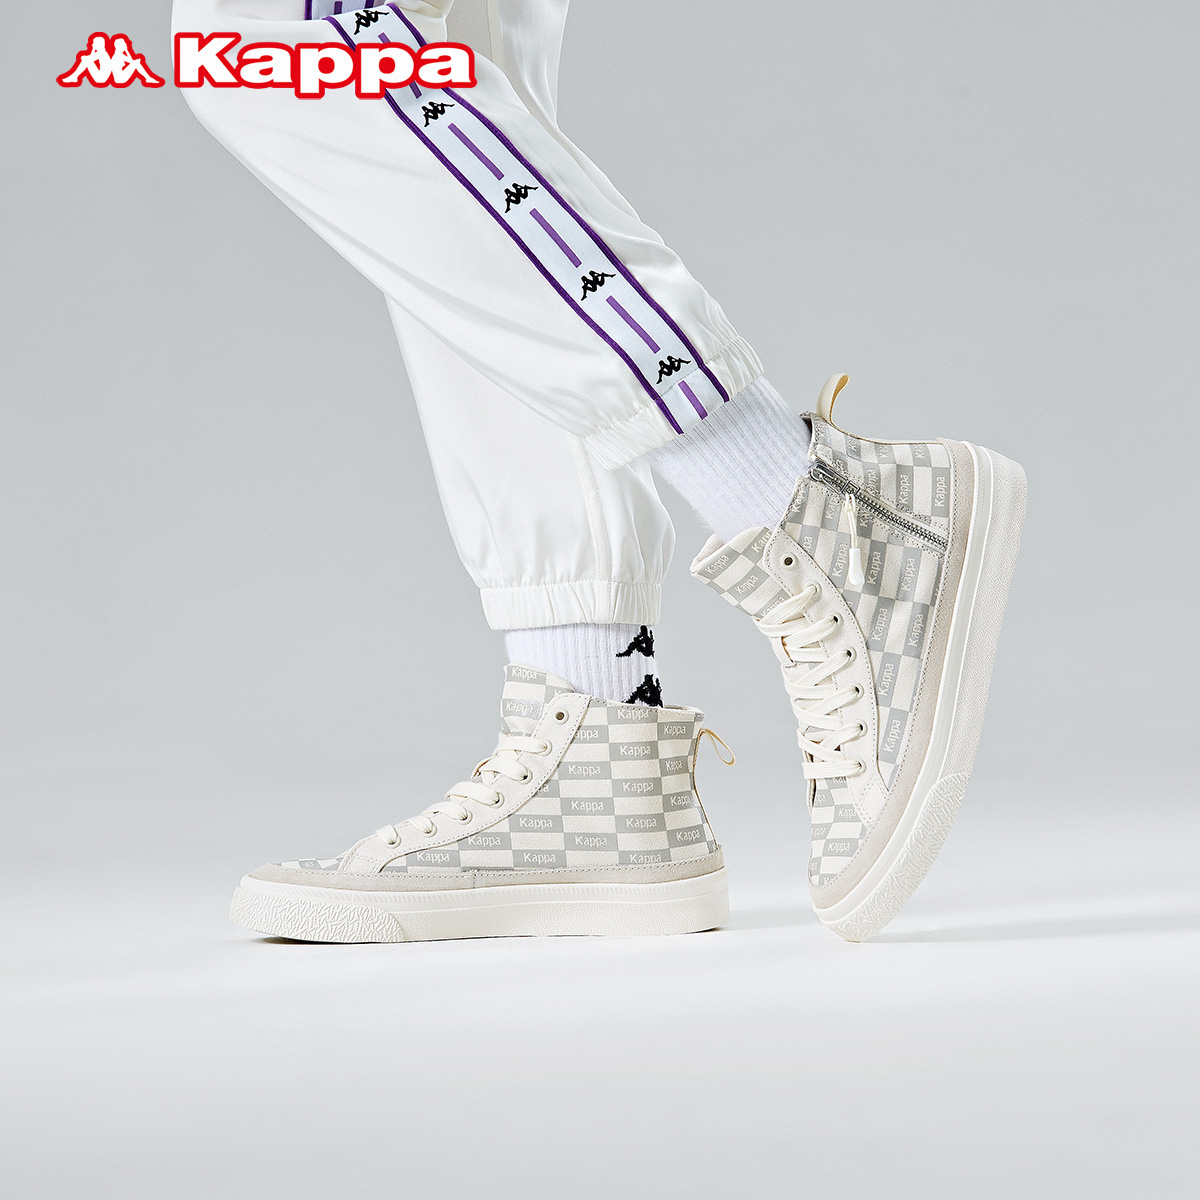 kappa串标帆布鞋新款情侣运动鞋值得买吗